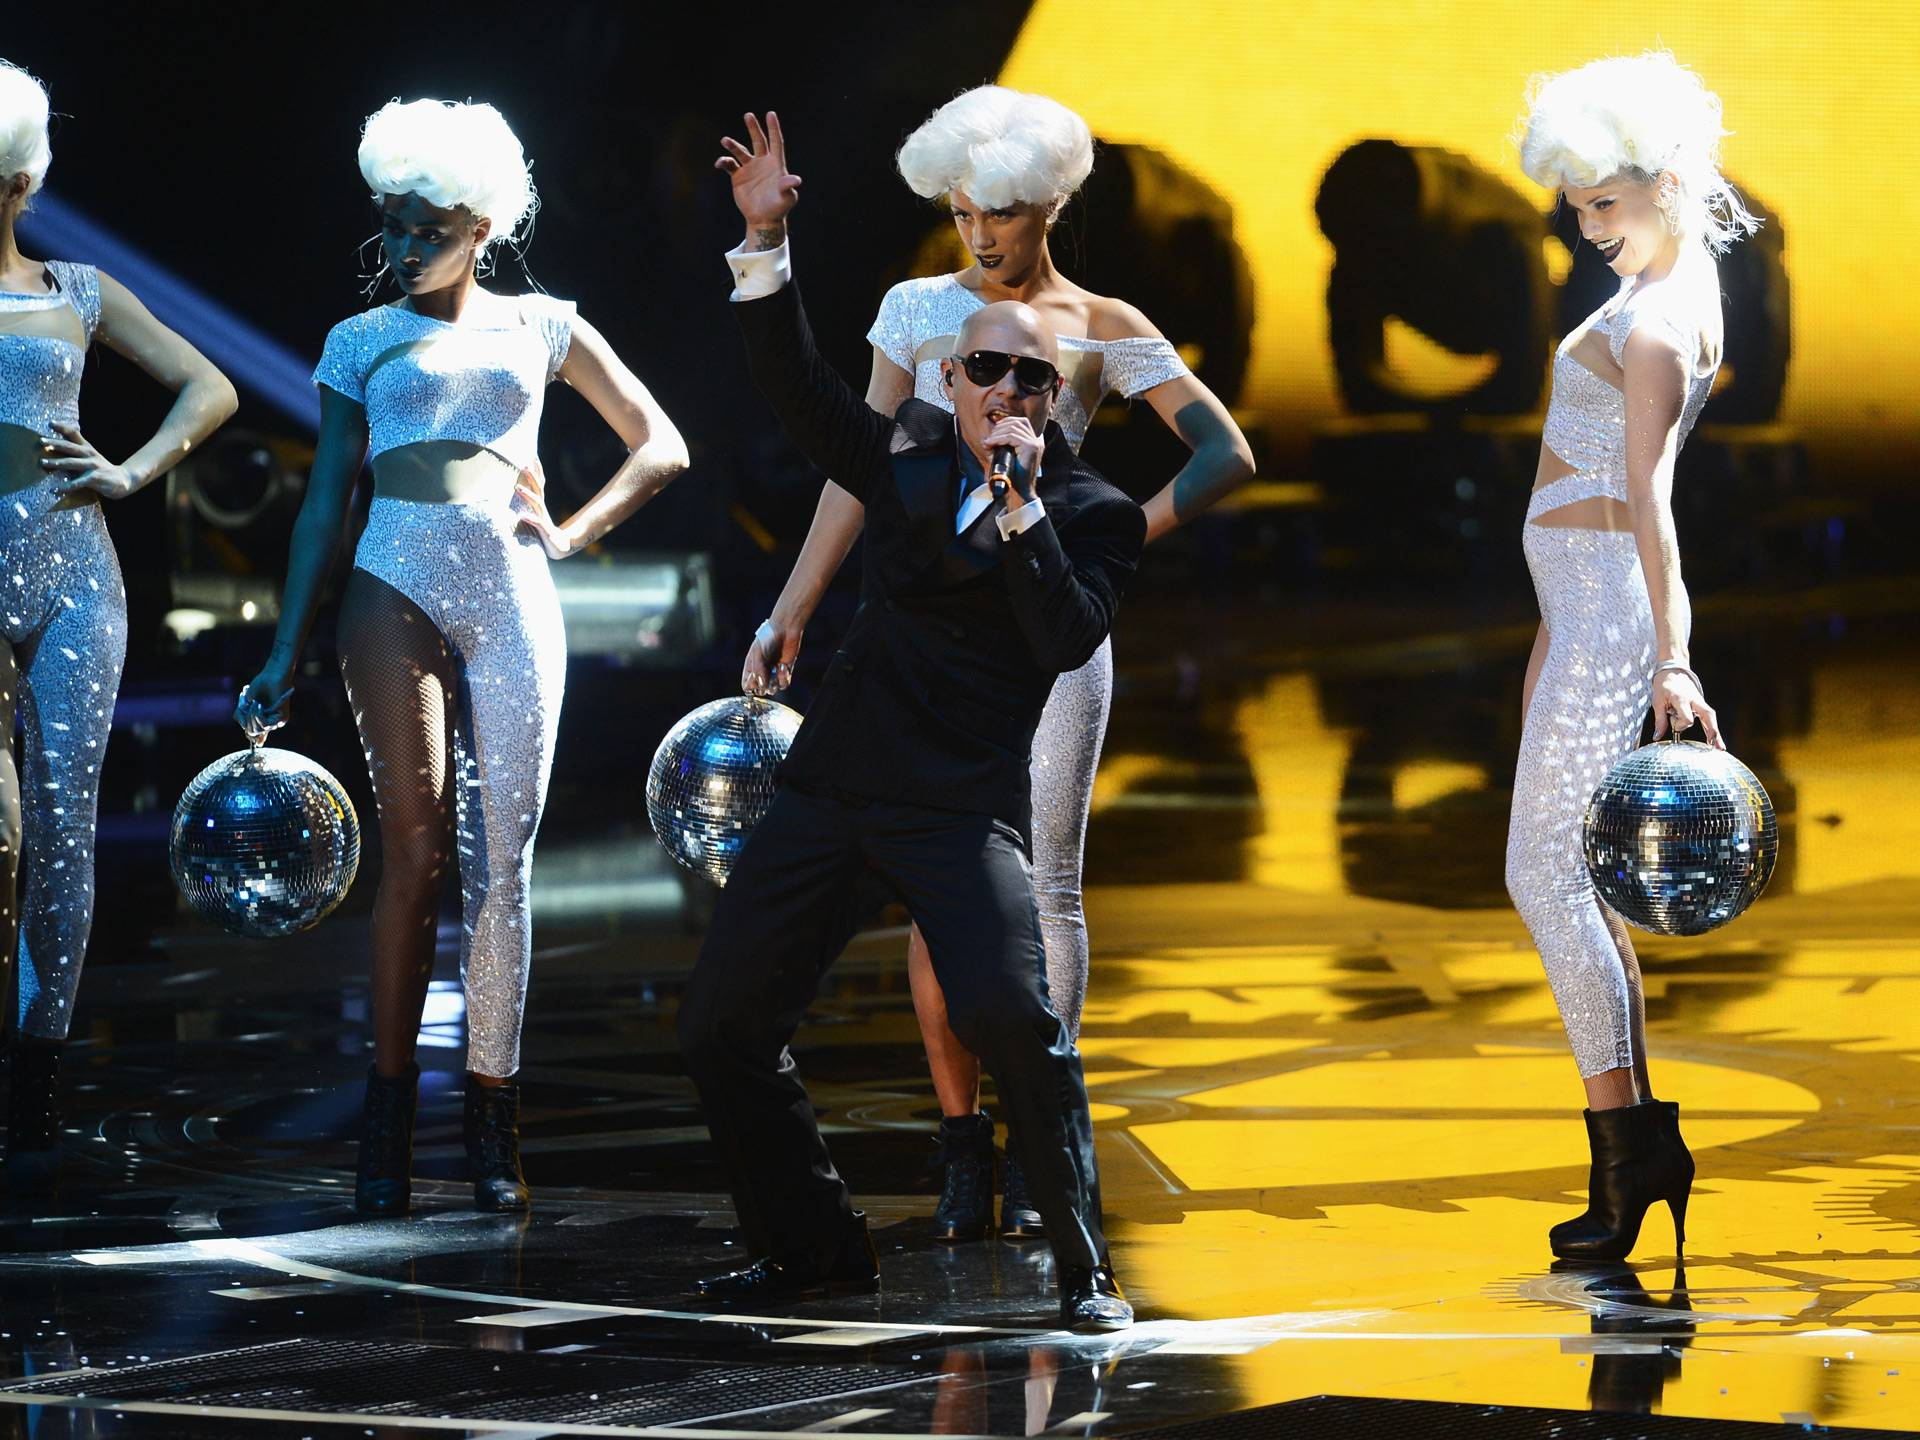 mgid:file:gsp:scenic:/international/mtvla.com/Pitbull_Getty-Images-for-MTV_156051099.jpg